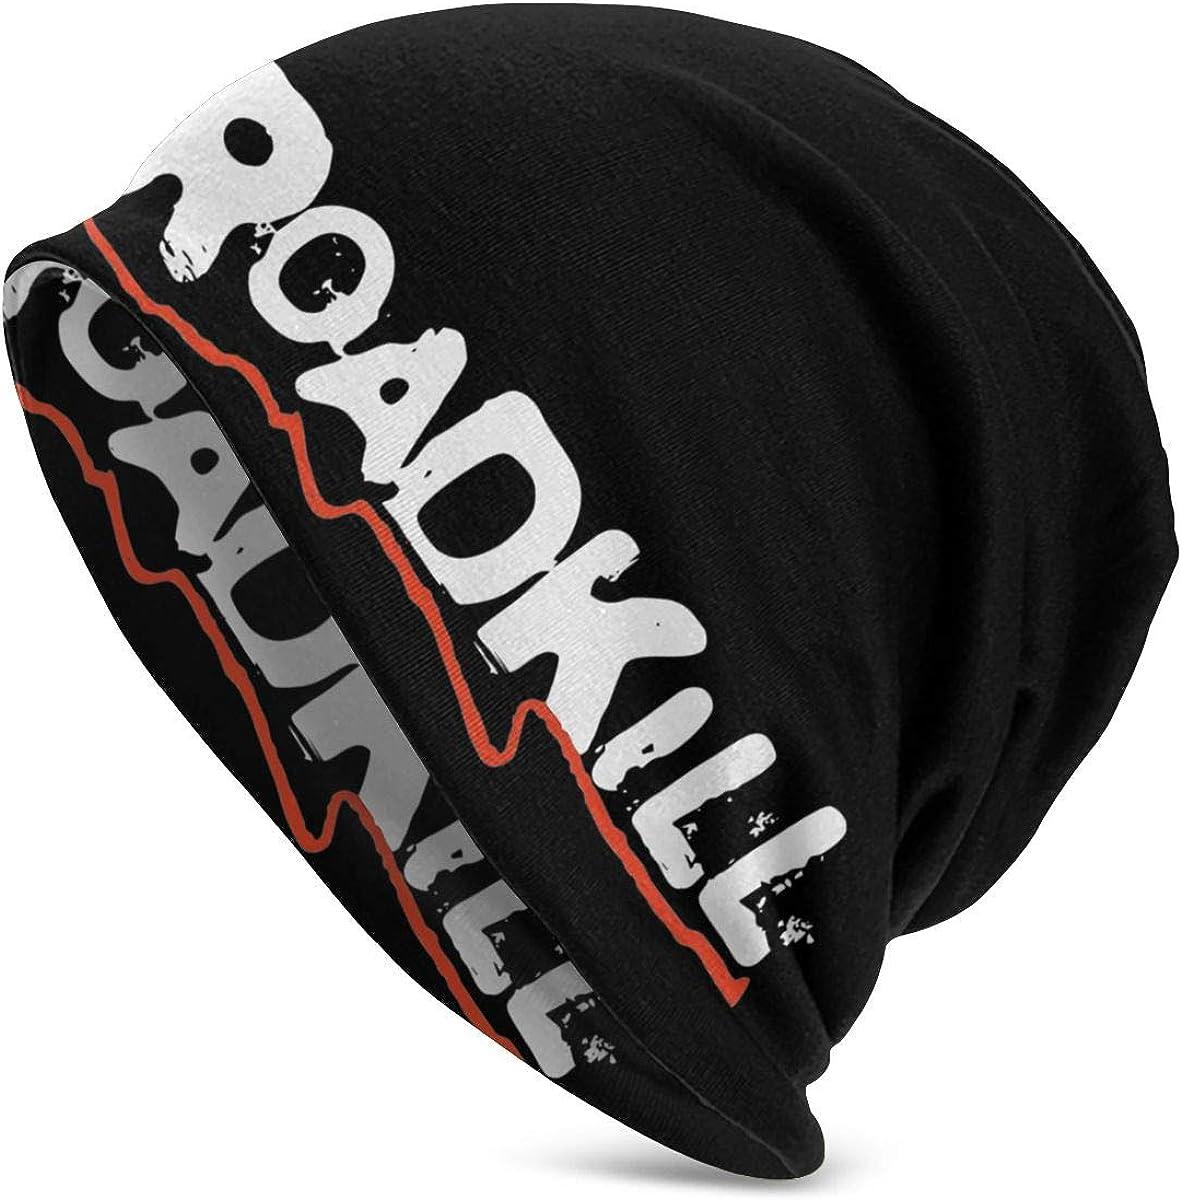 Outdoor Knit Hat Top Level Beanie Unisex Cap Balaclava Hat Road-Kill Design Warm Fedoras Hat